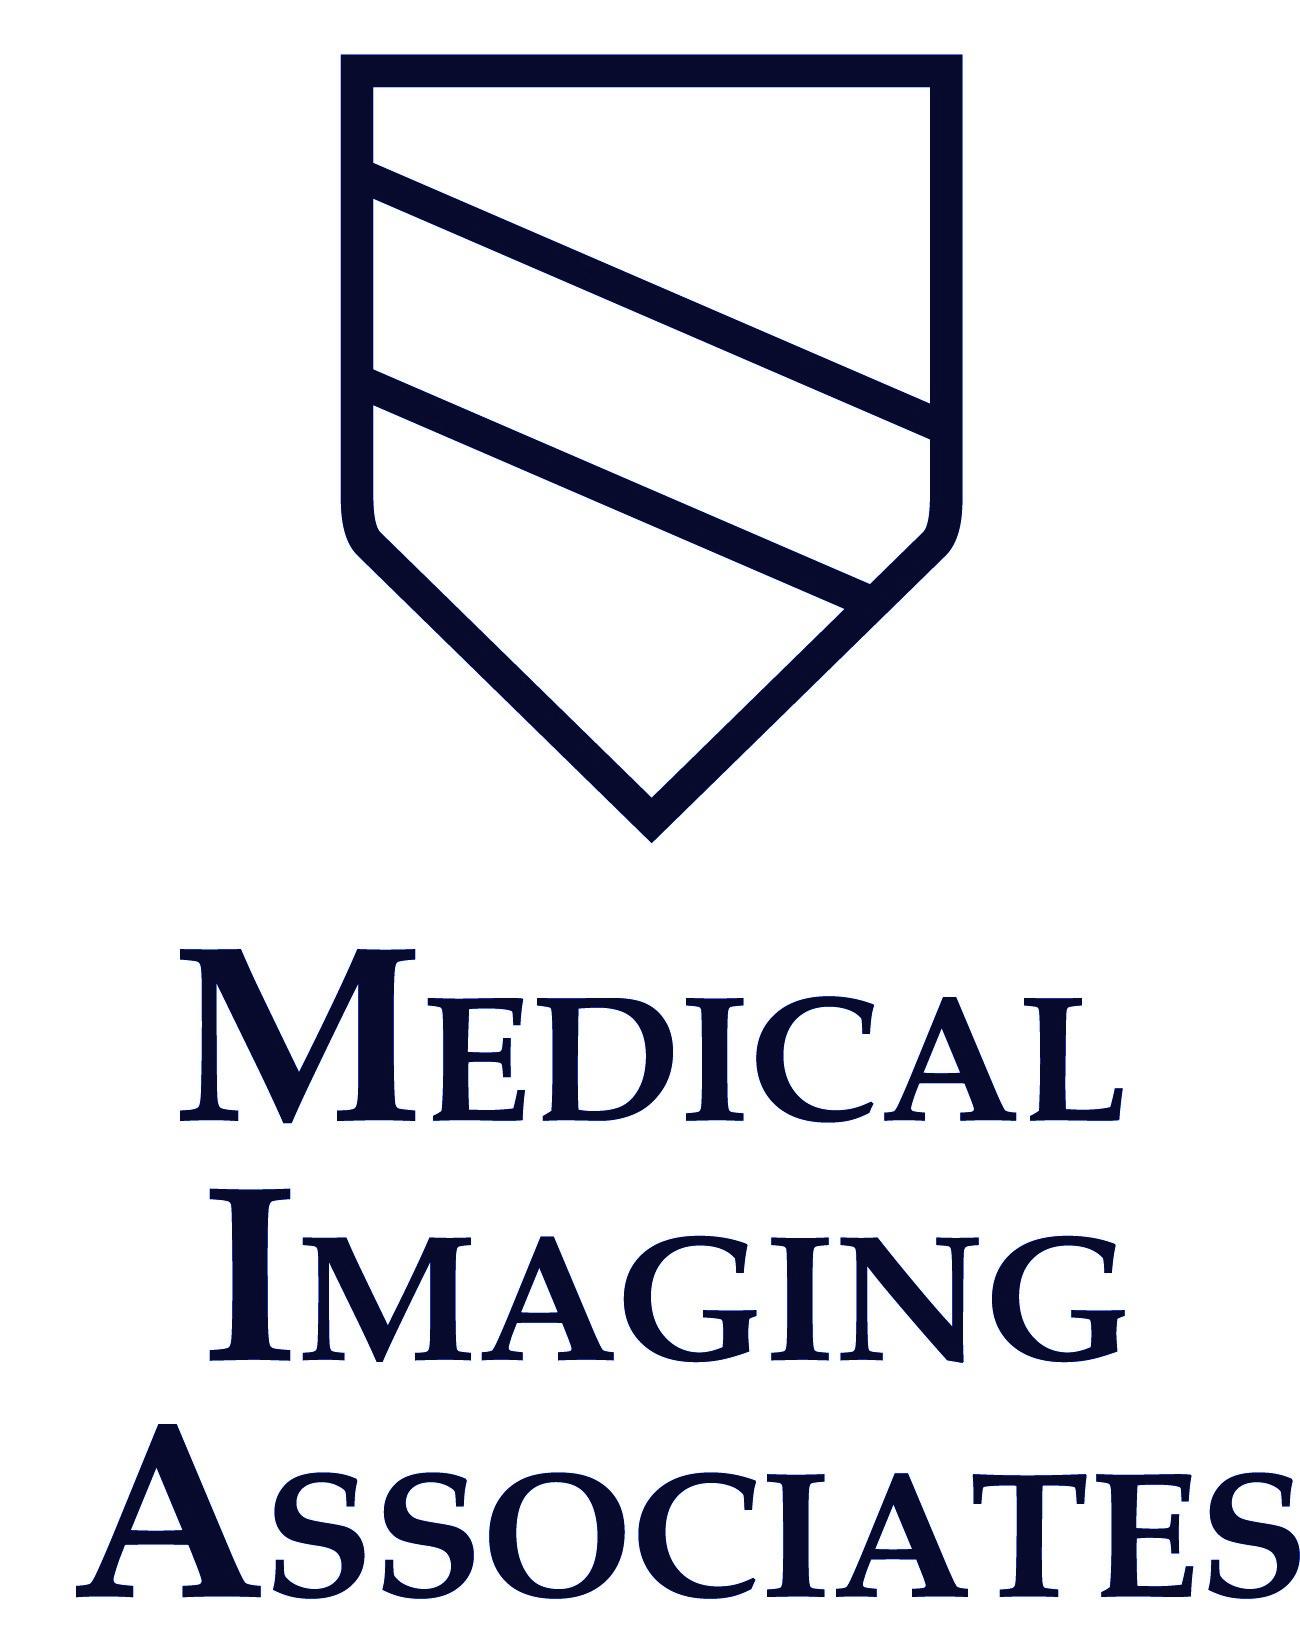 Medical Imaging Associates